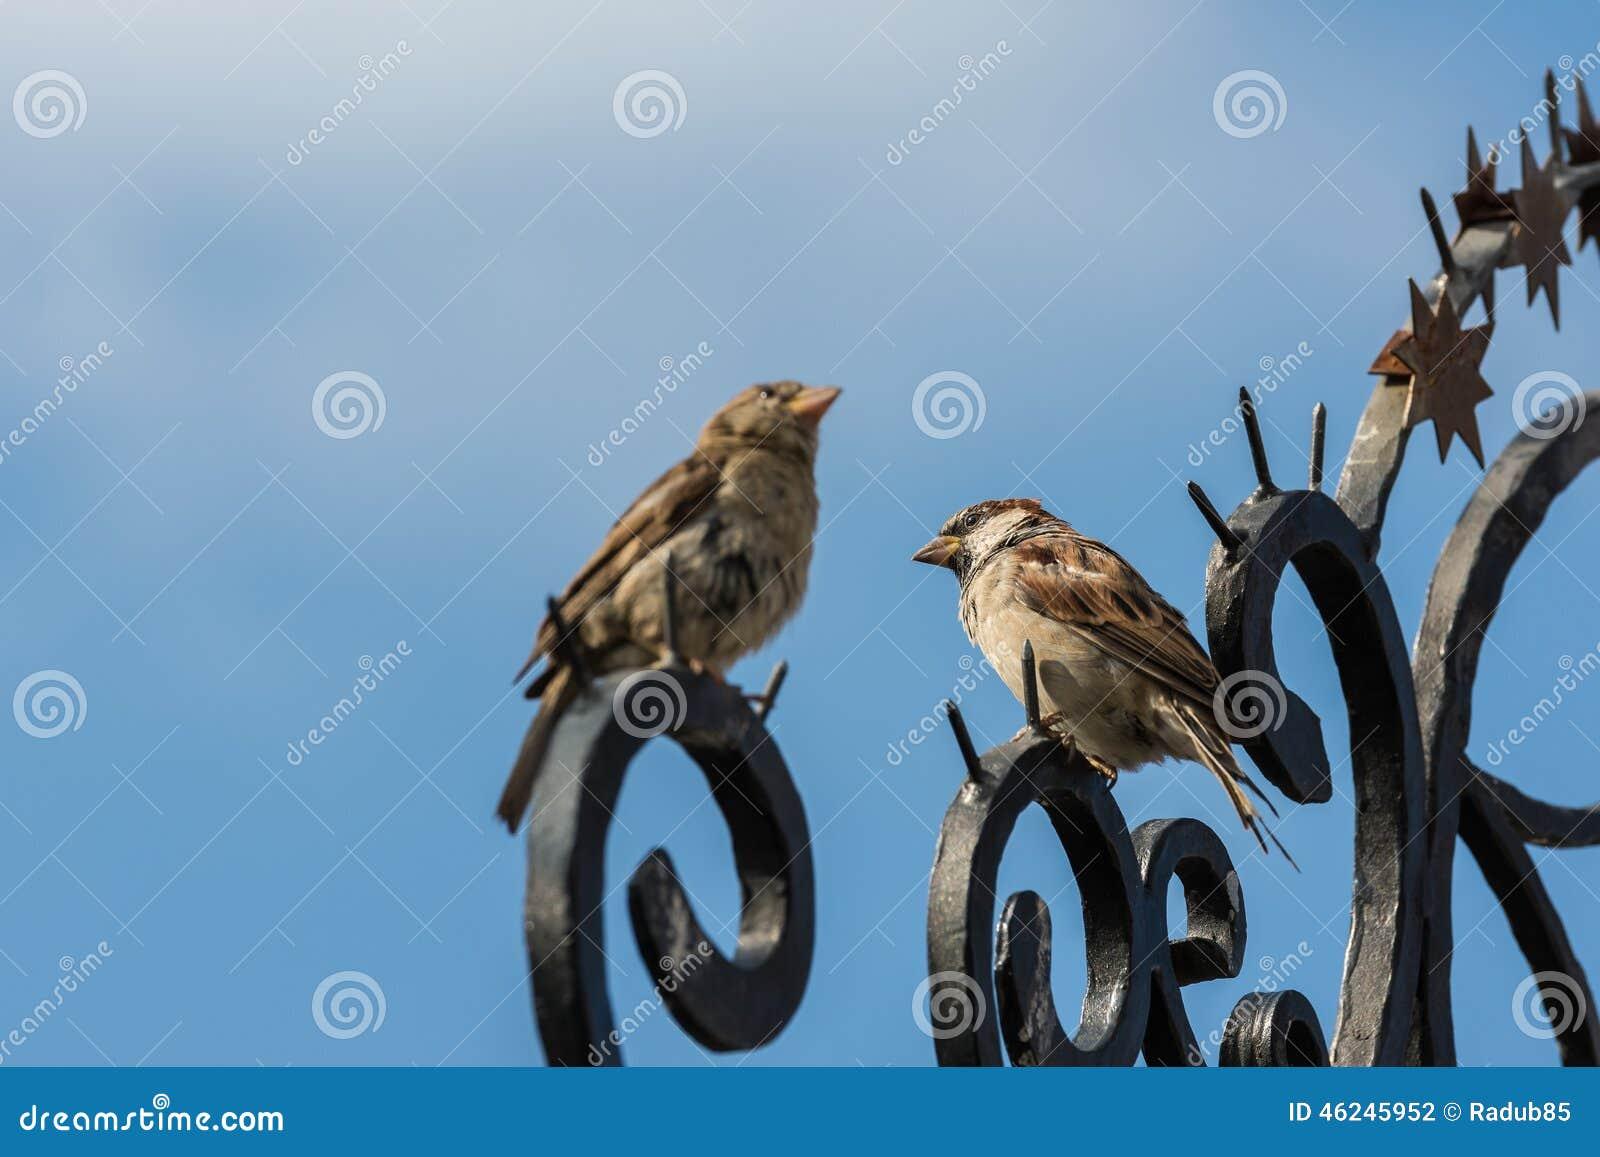 Small Sparrow Birds